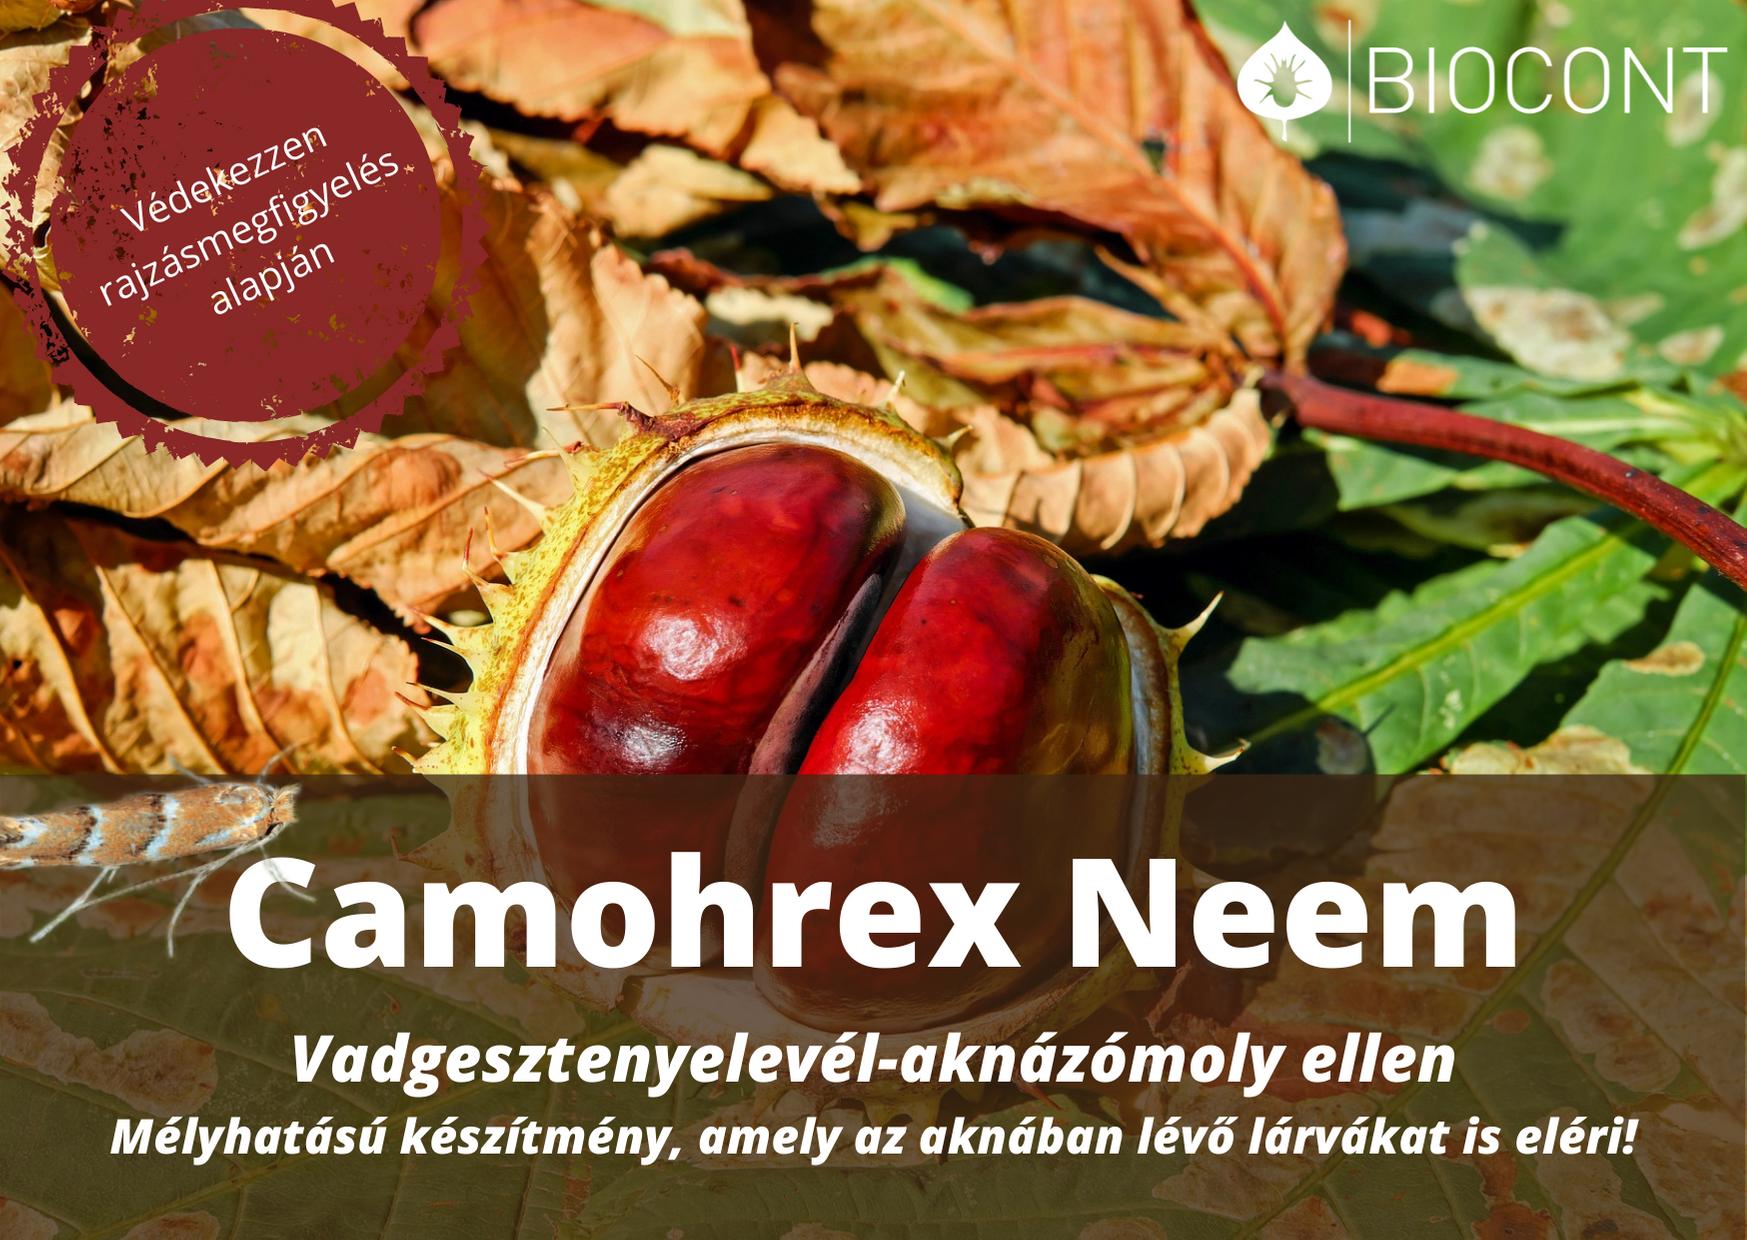 Camohrex-Neem-Vadgesztenyelevel-aknazomoly.